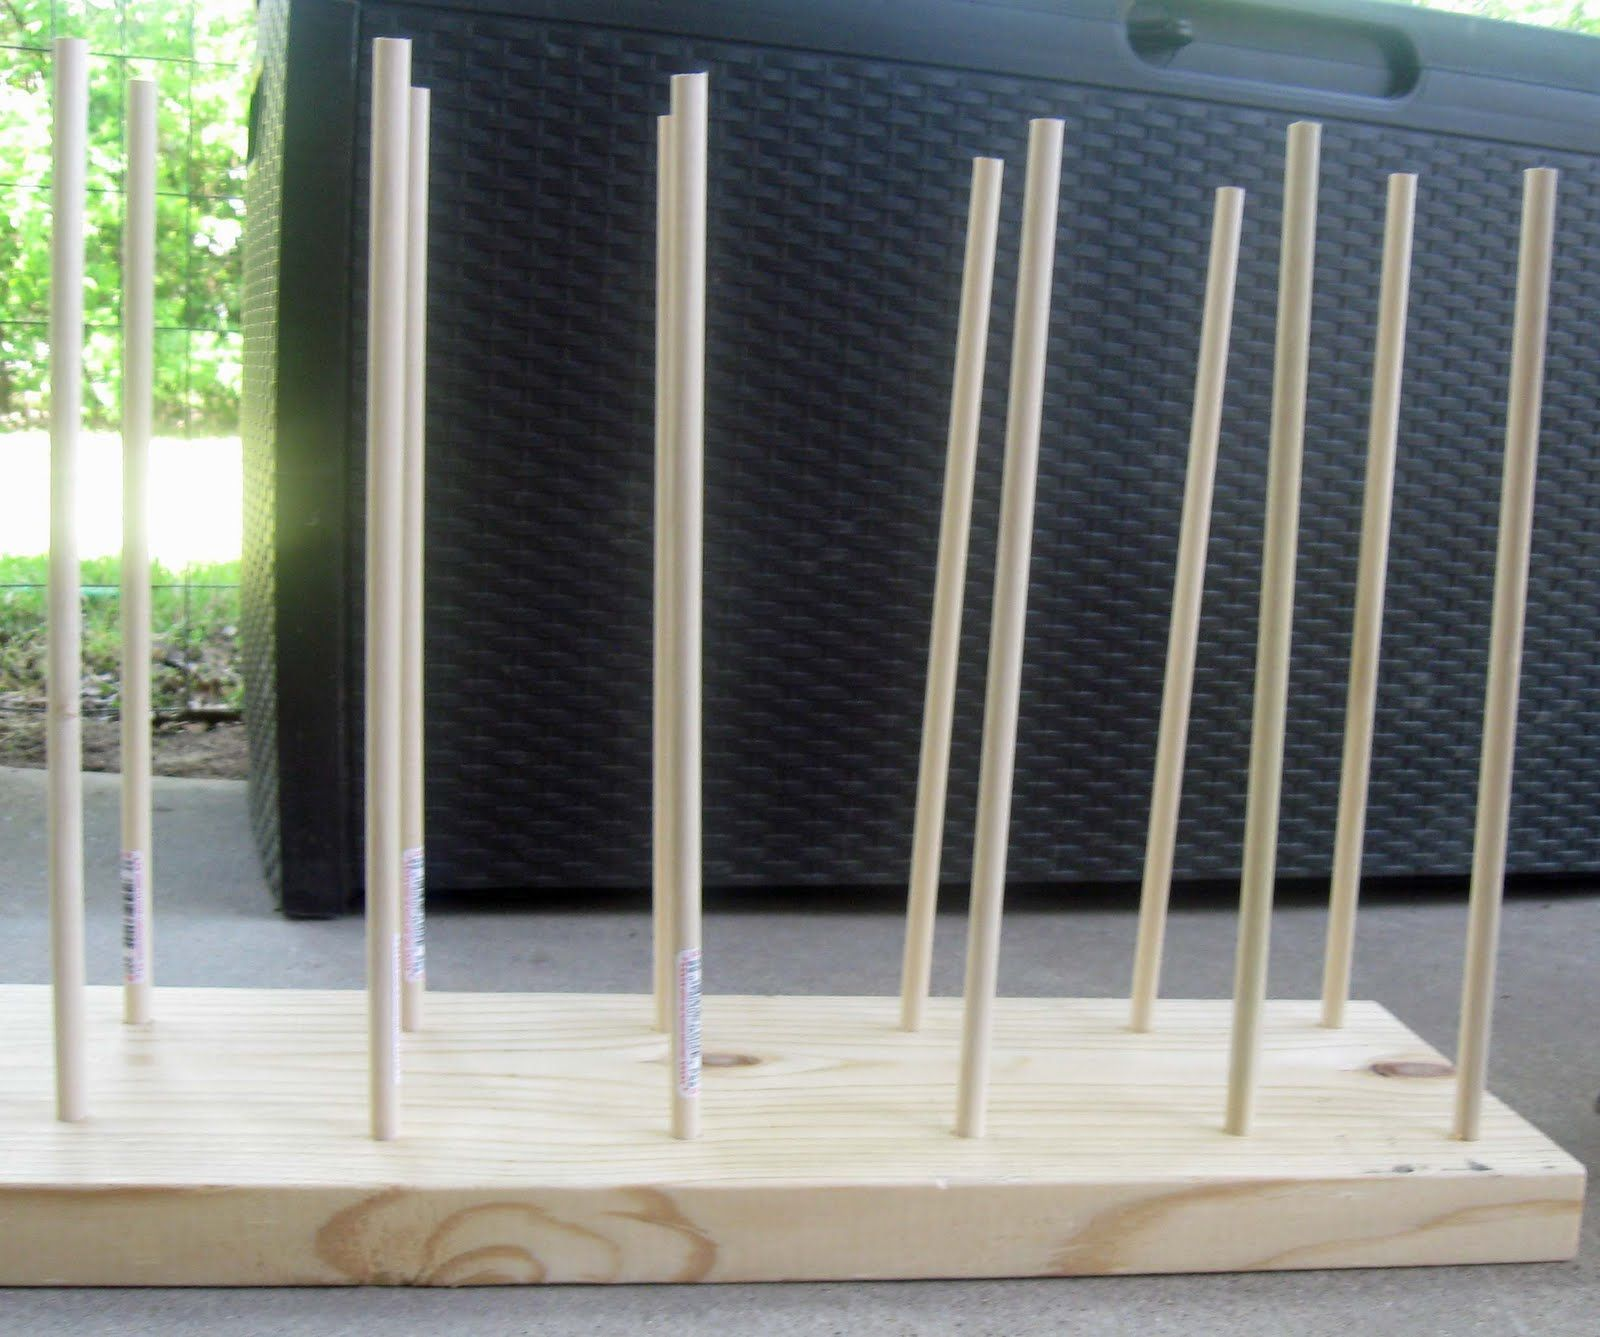 Pigtails paper trails ribbon storage idea and tutorial storage